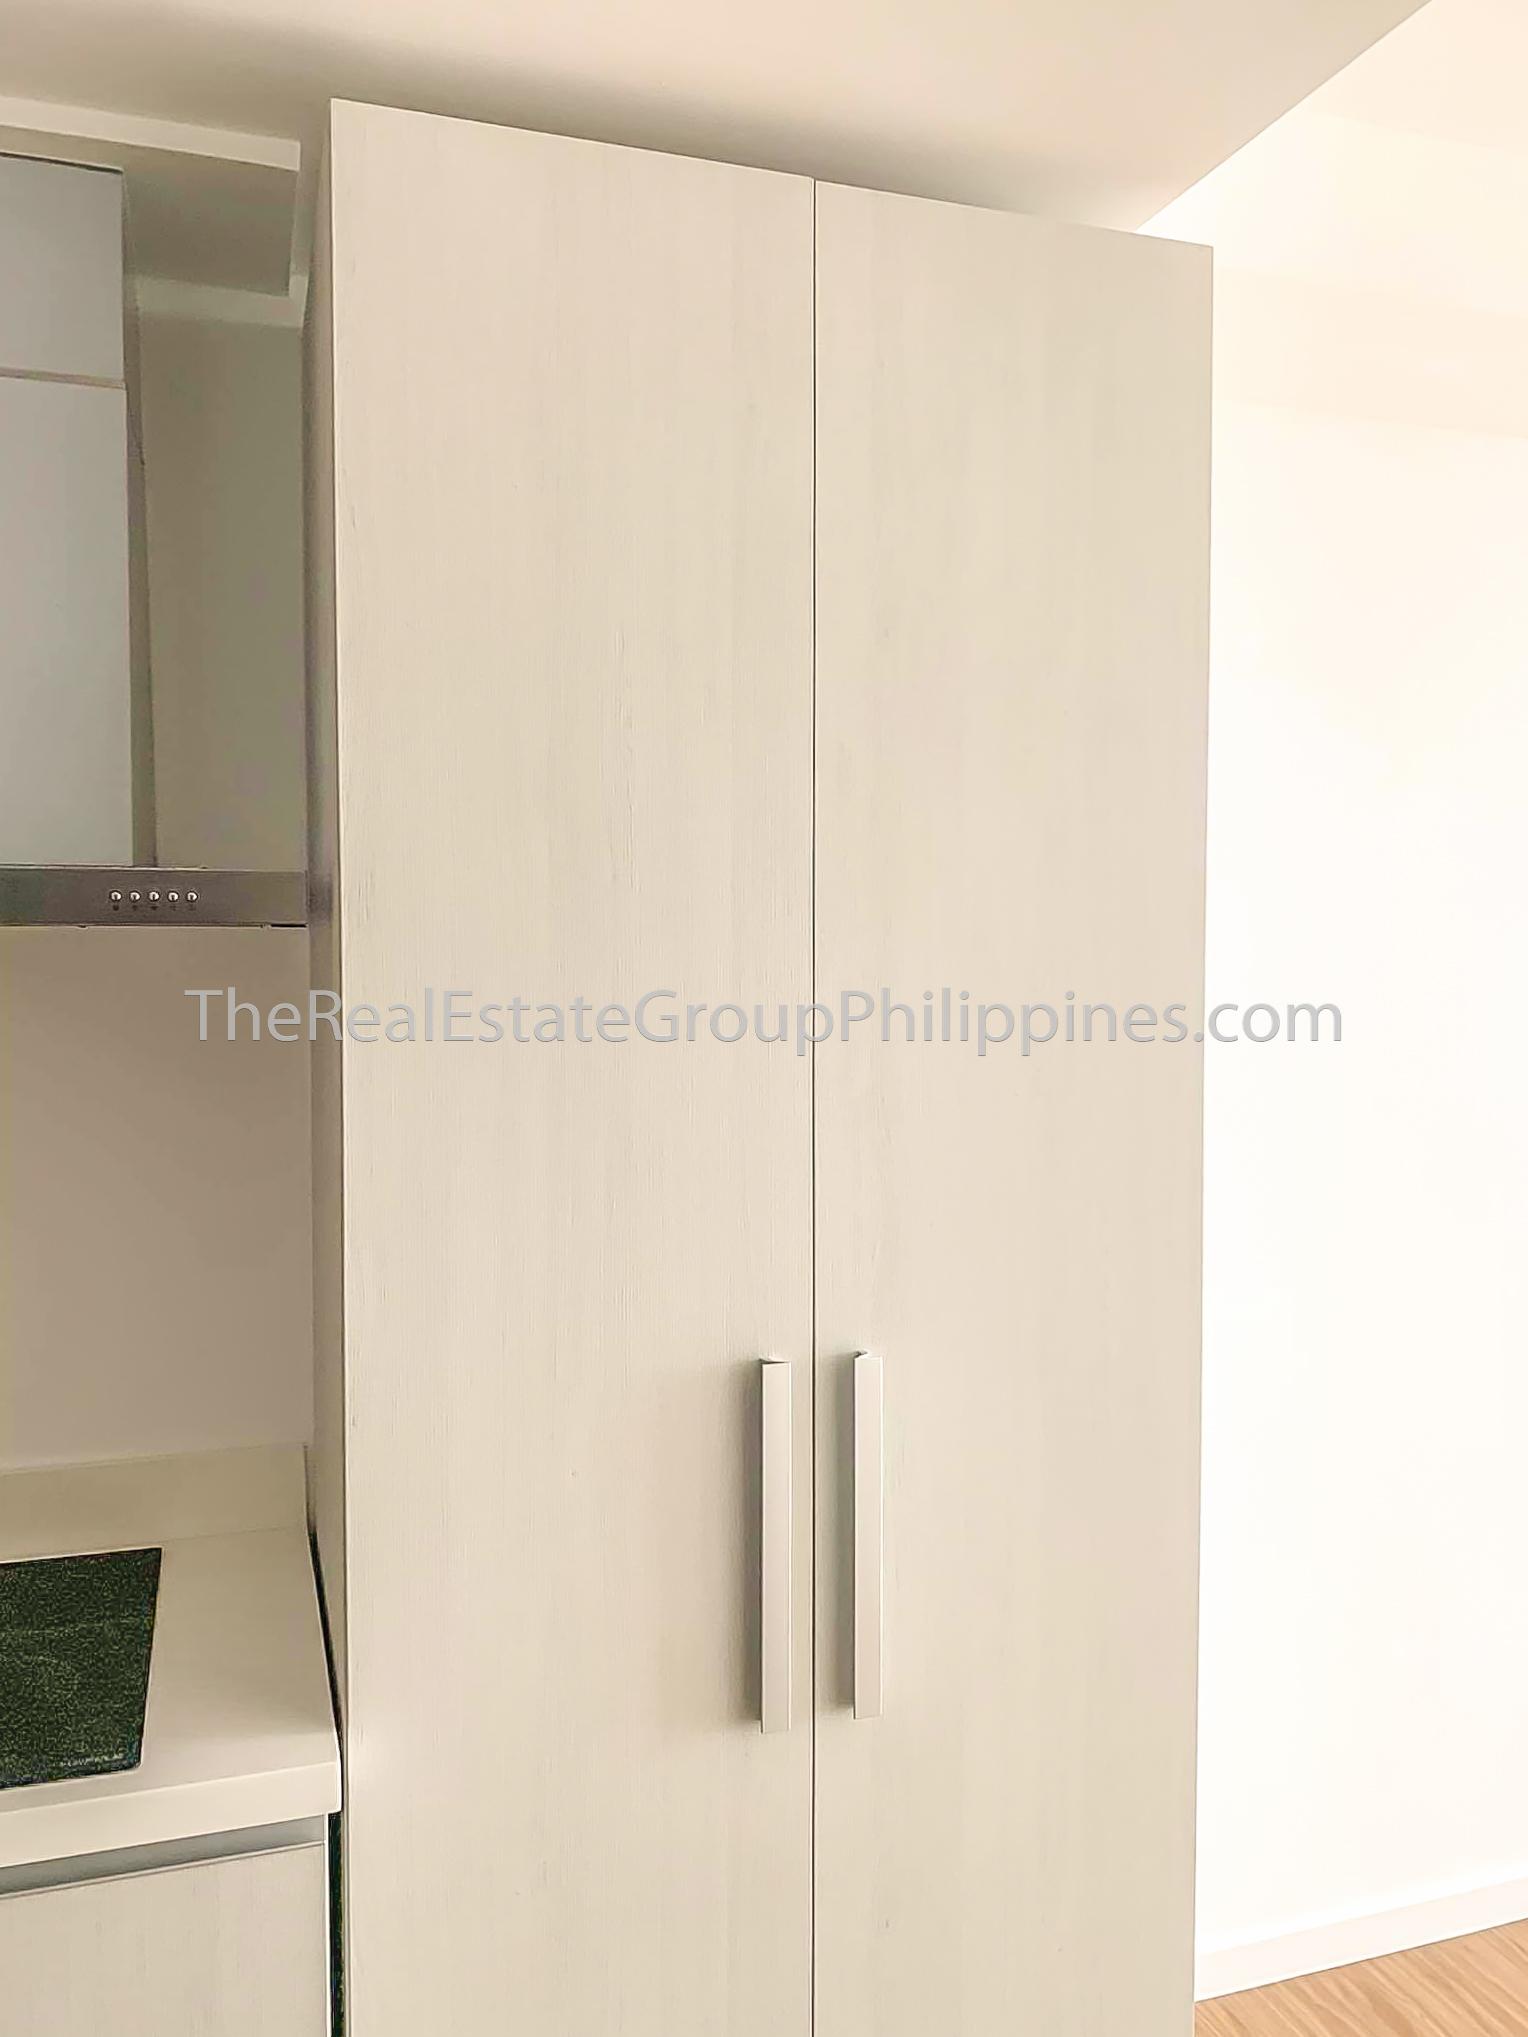 Studio Condo For Sale Novotel Acqua Residences Mandaluyong-9